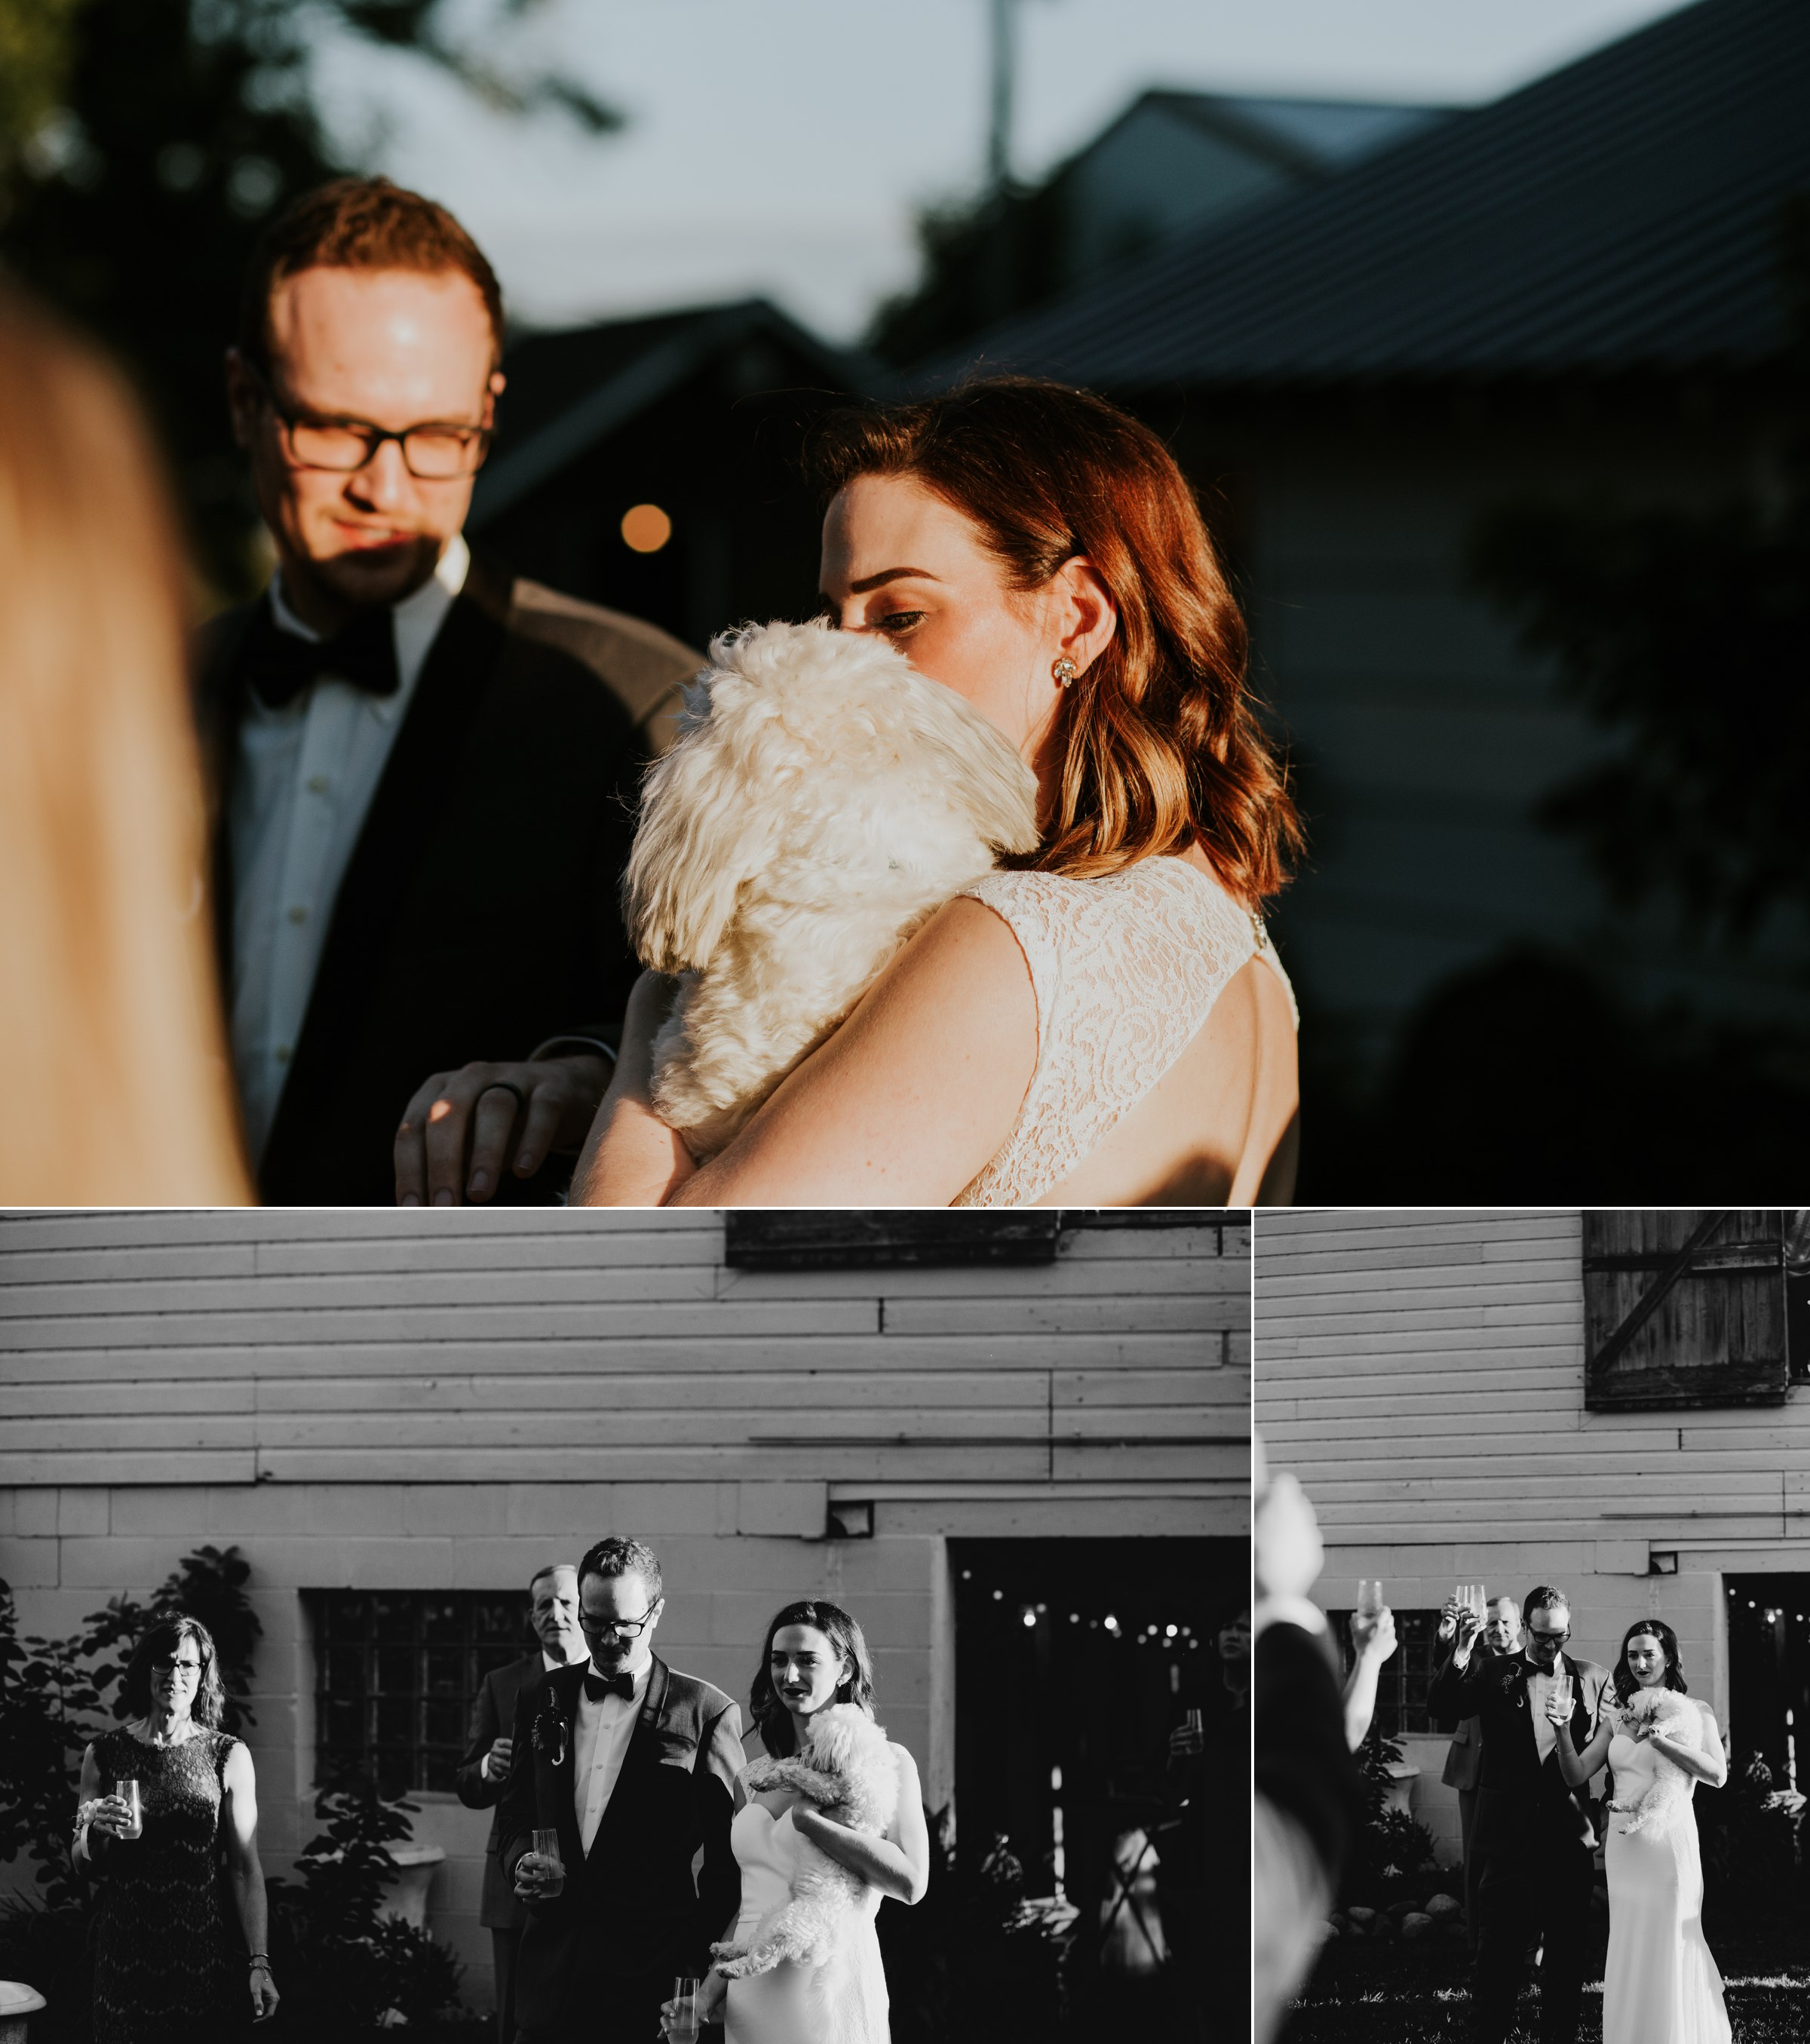 caroline and taylor minneapolis minnesota texas austin dallas houston wedding elopement destination intimate adventurous couple best photographer_0248.jpg